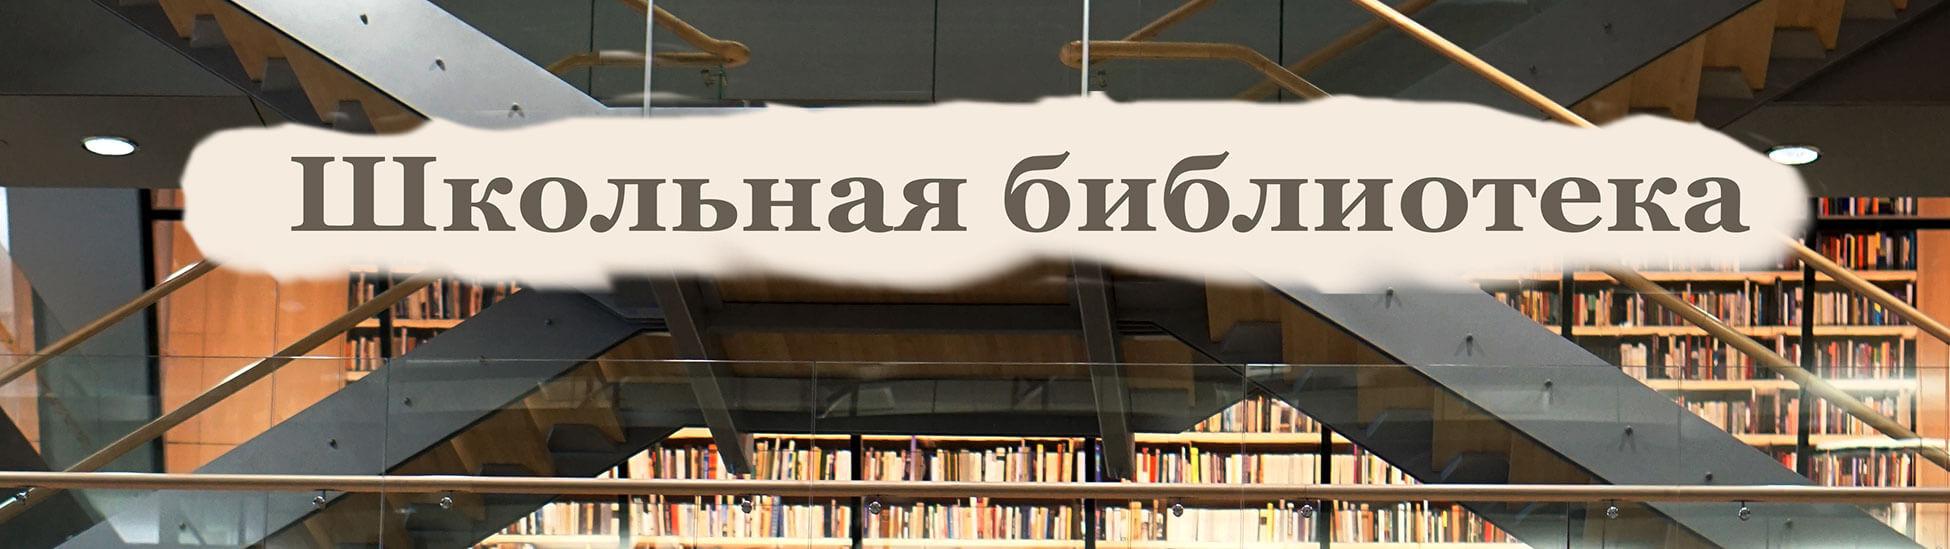 Школьная библиотека - Шахматы